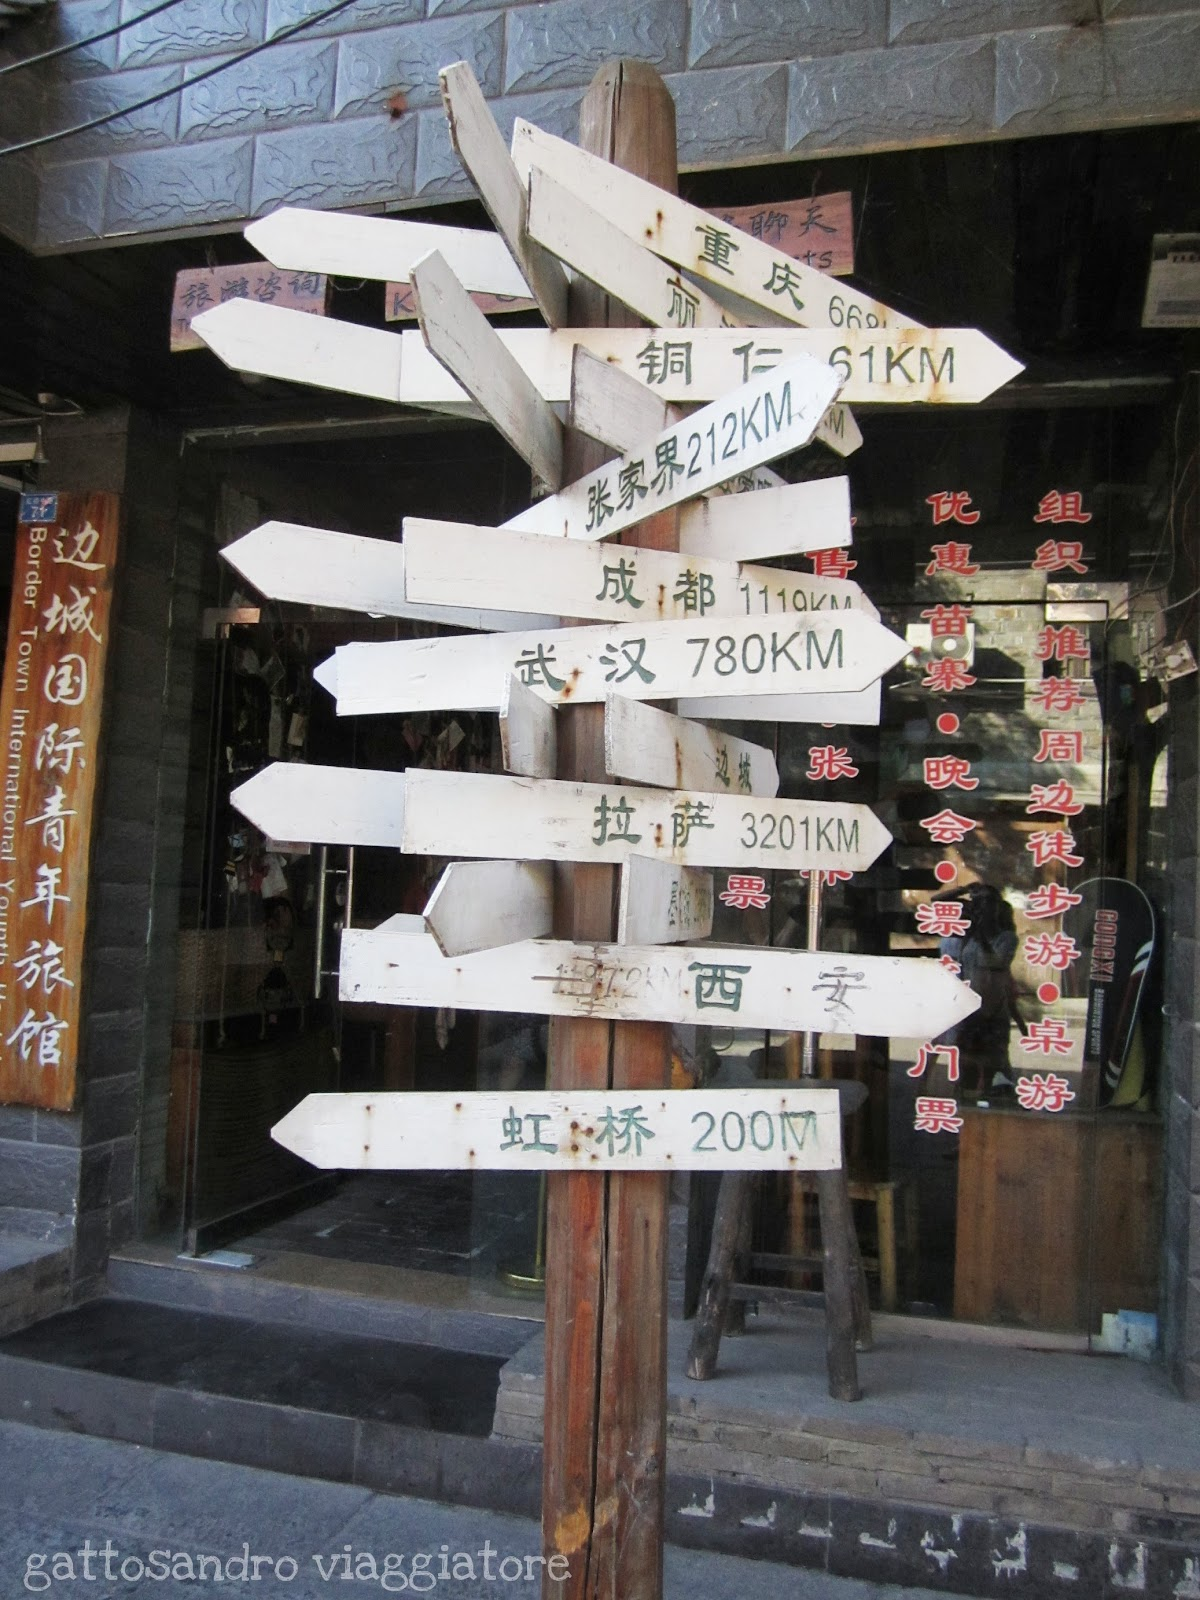 Gattosandro viaggiatore travel blog fenghuang for Case giapponesi antiche